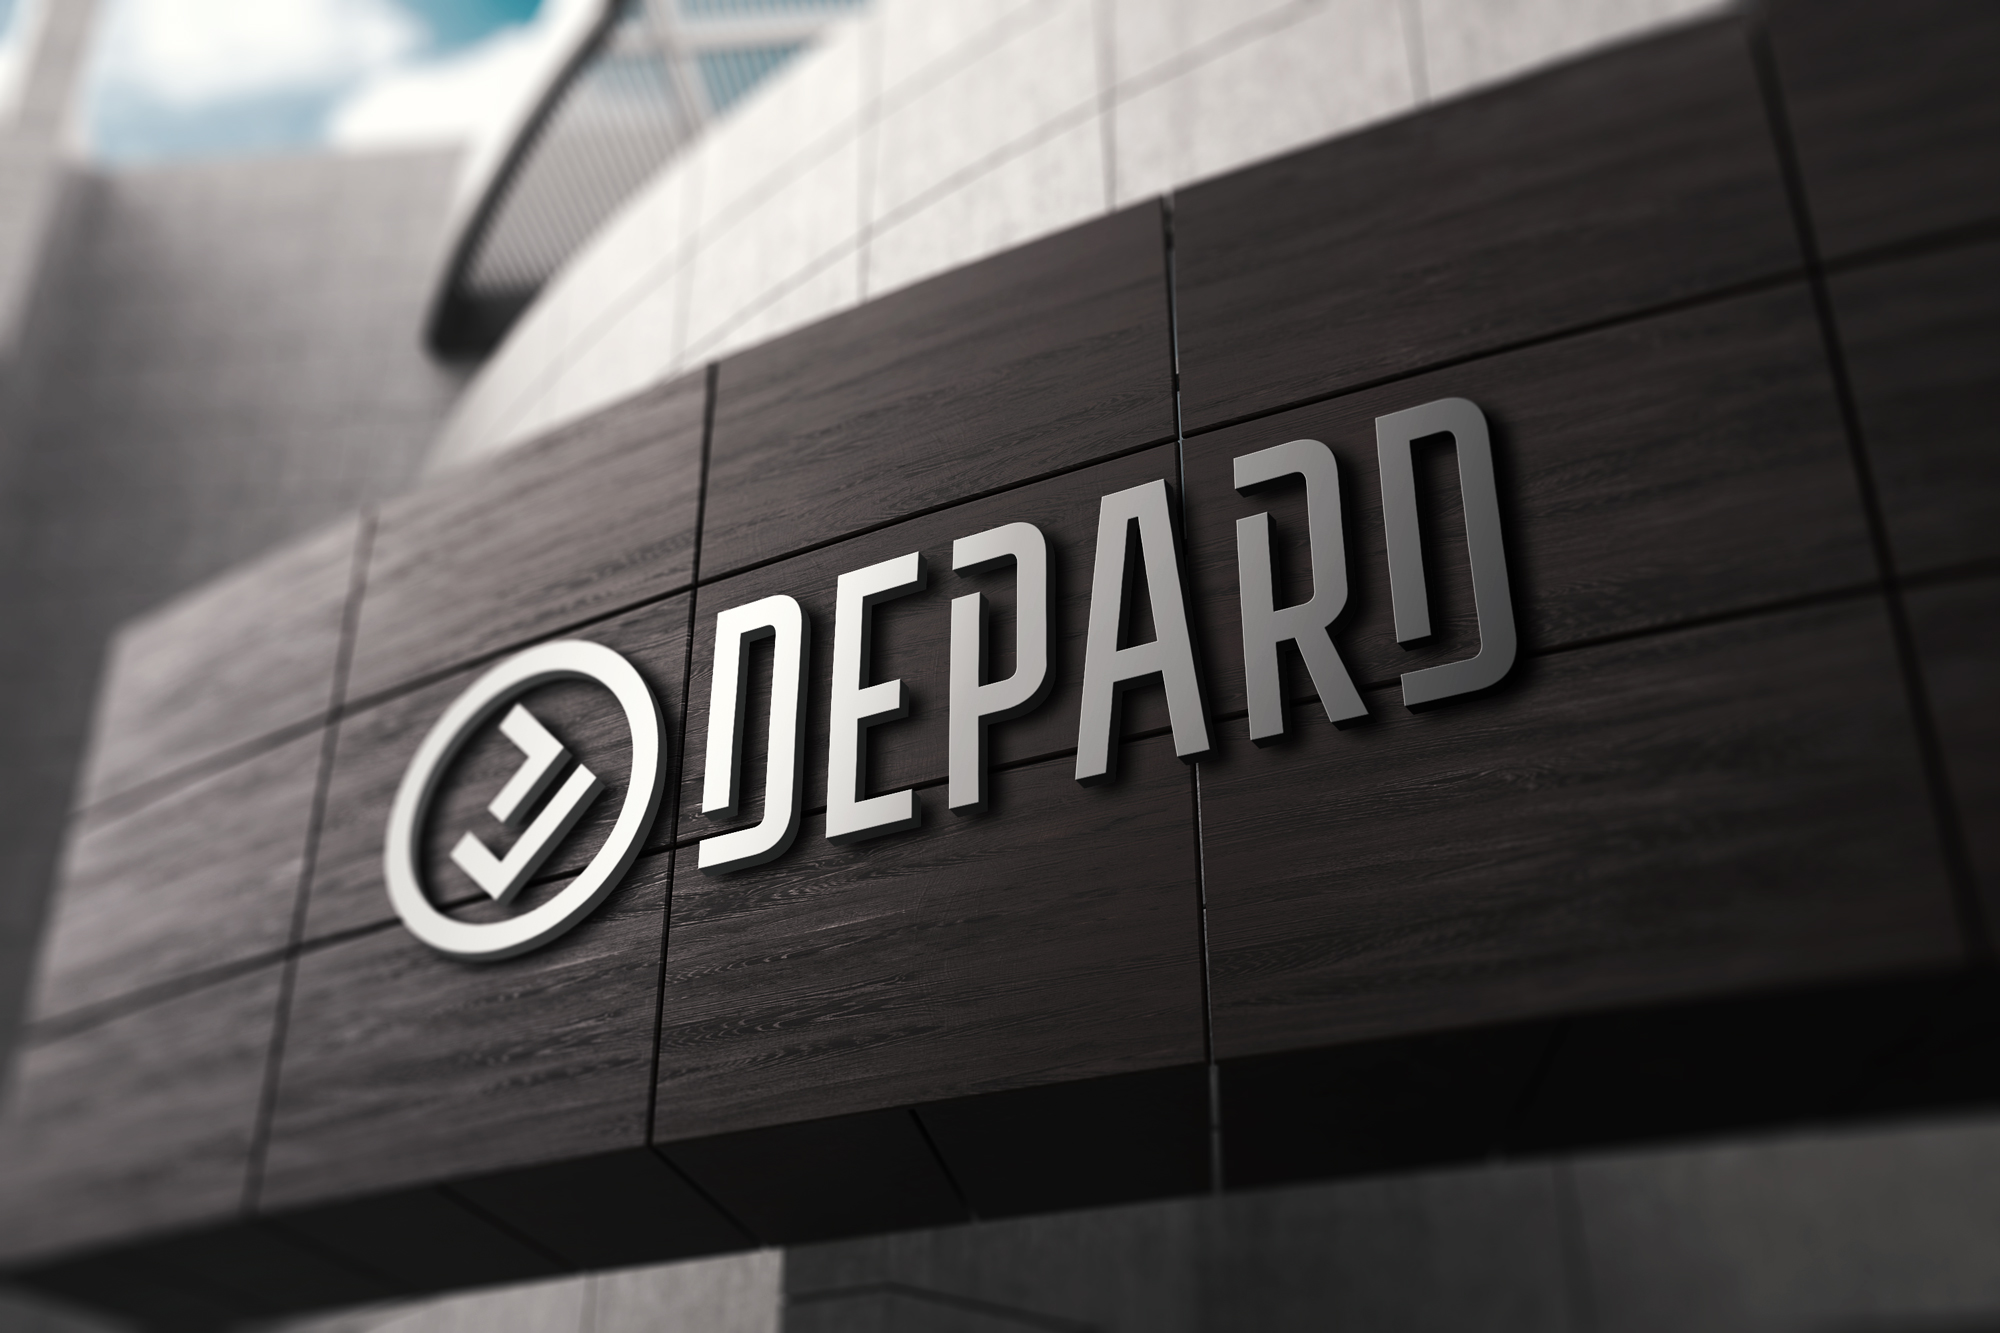 Логотип для компании (услуги недвижимость) фото f_7705935881f56059.jpg